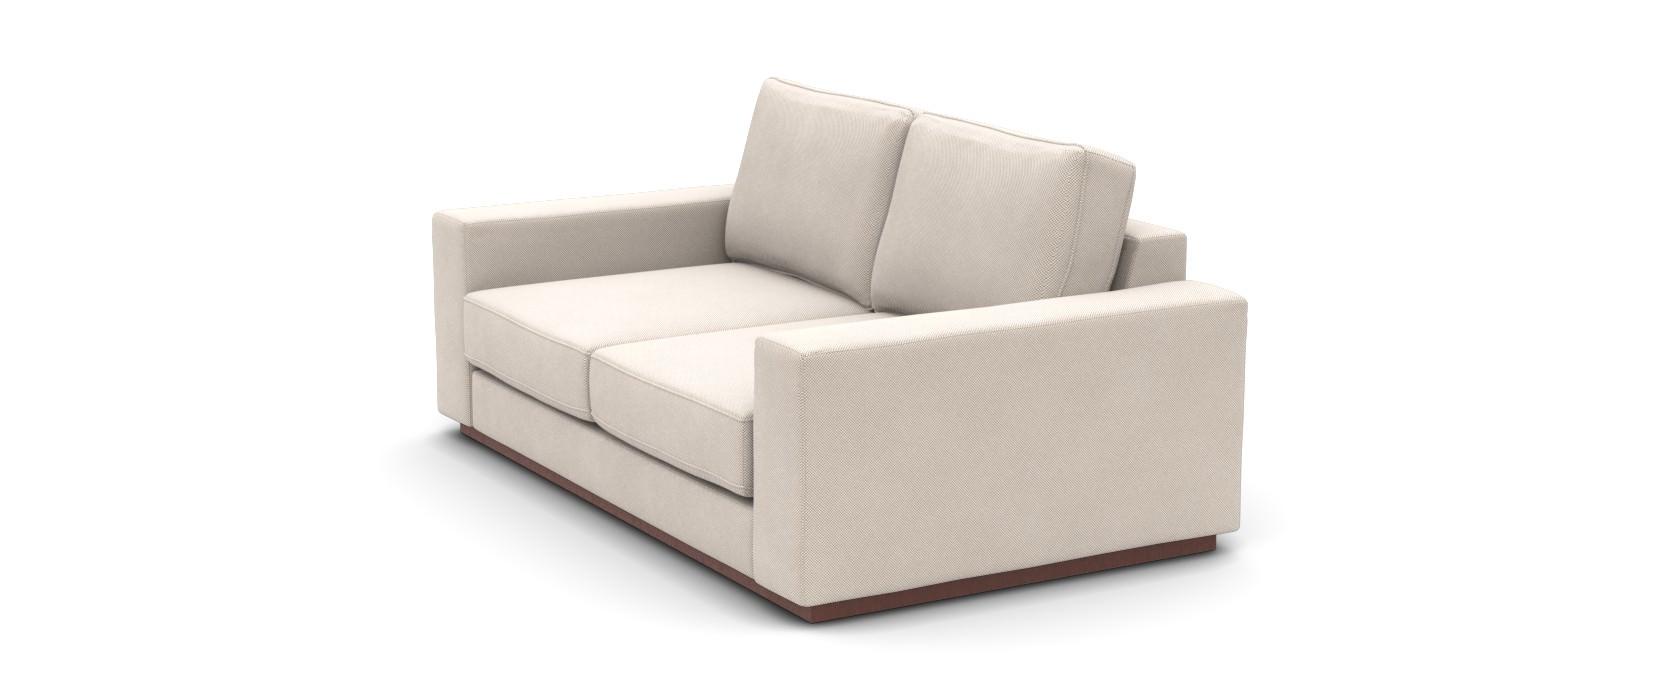 2-Sitzer Sofa Milano Lounge